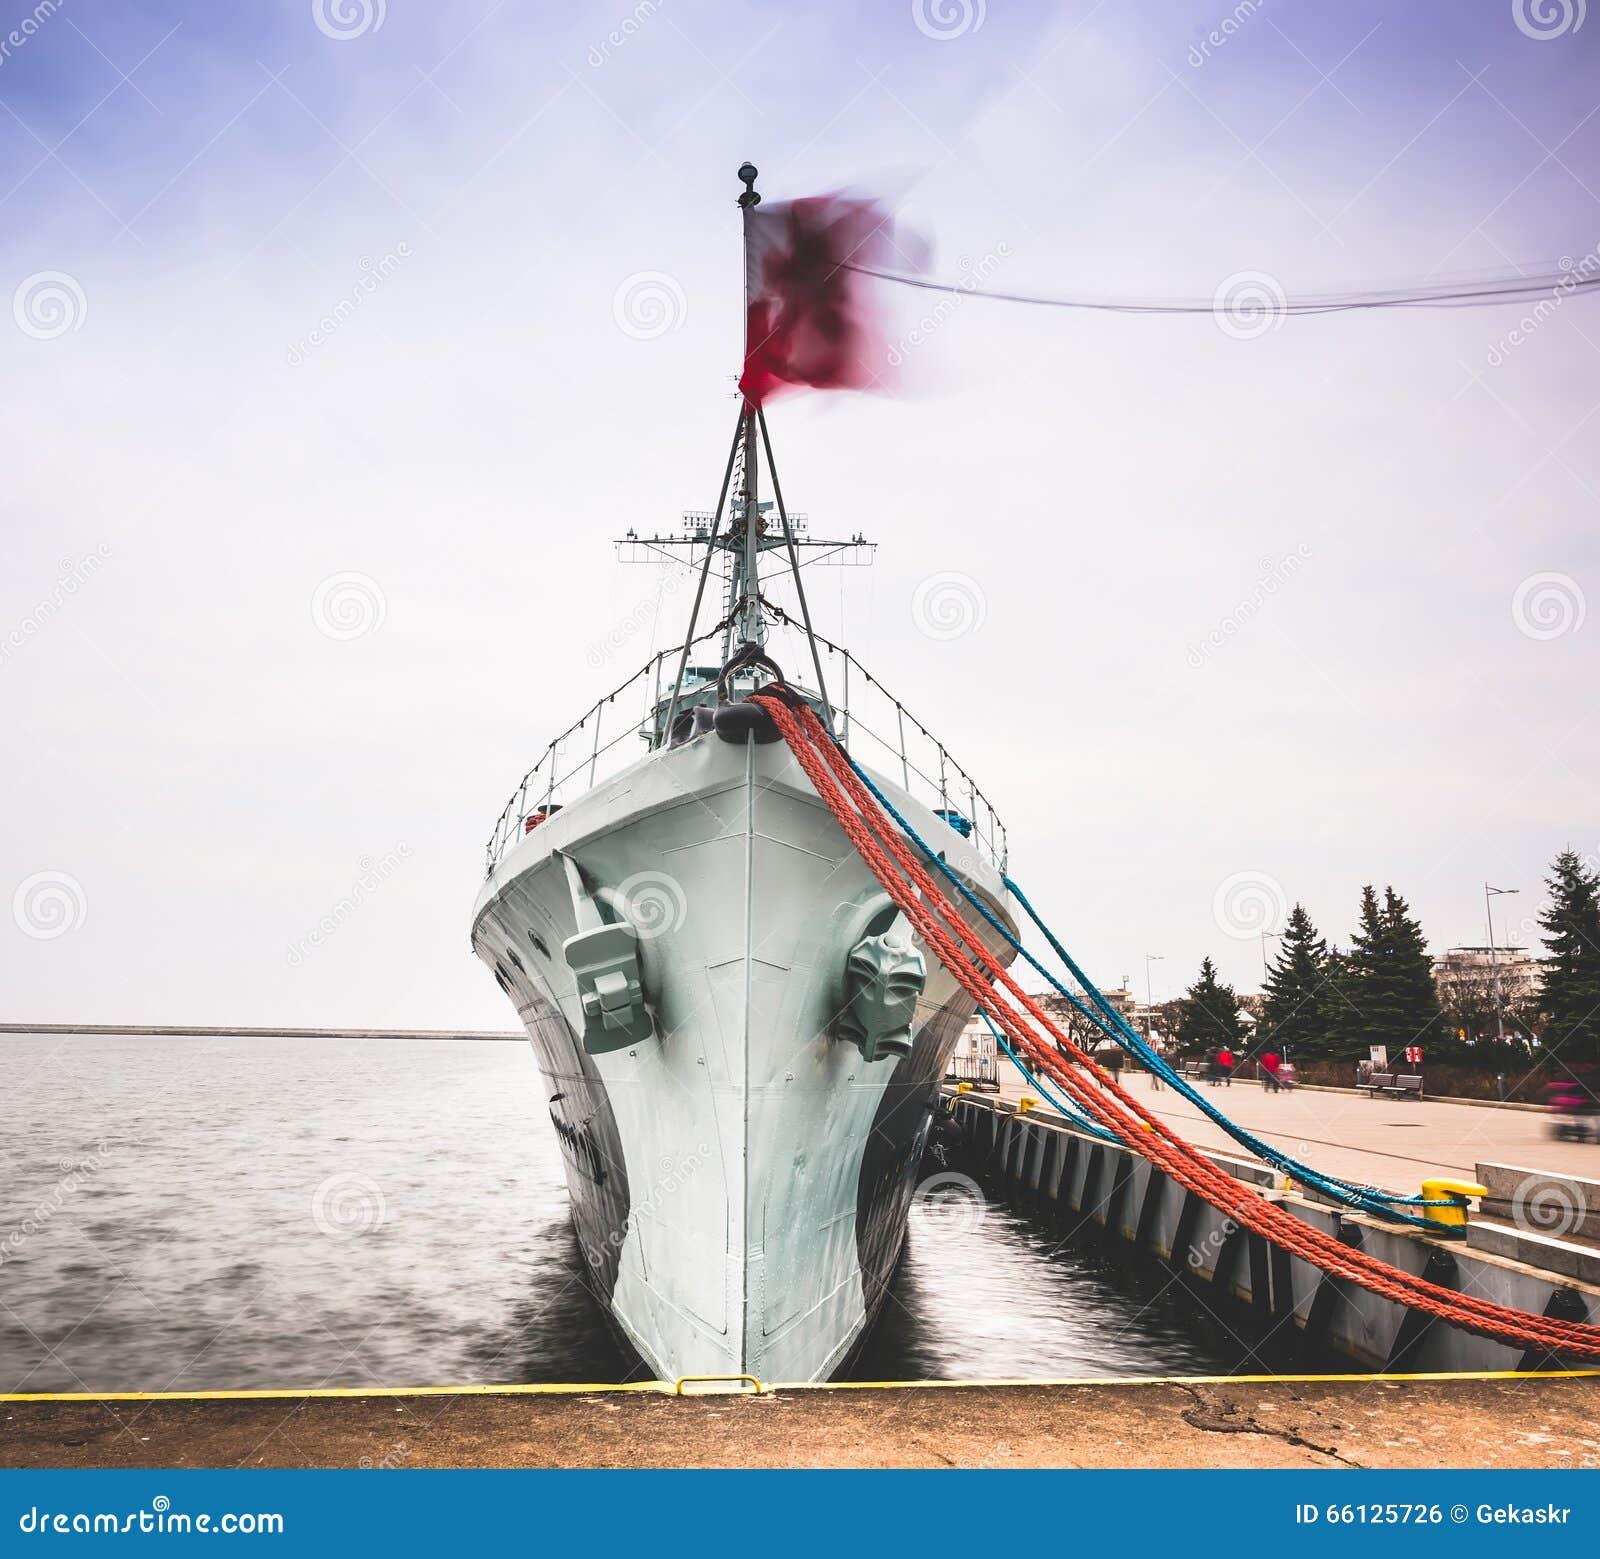 Warship in Gdansk stock photo  Image of cloudy, landmark - 66125726